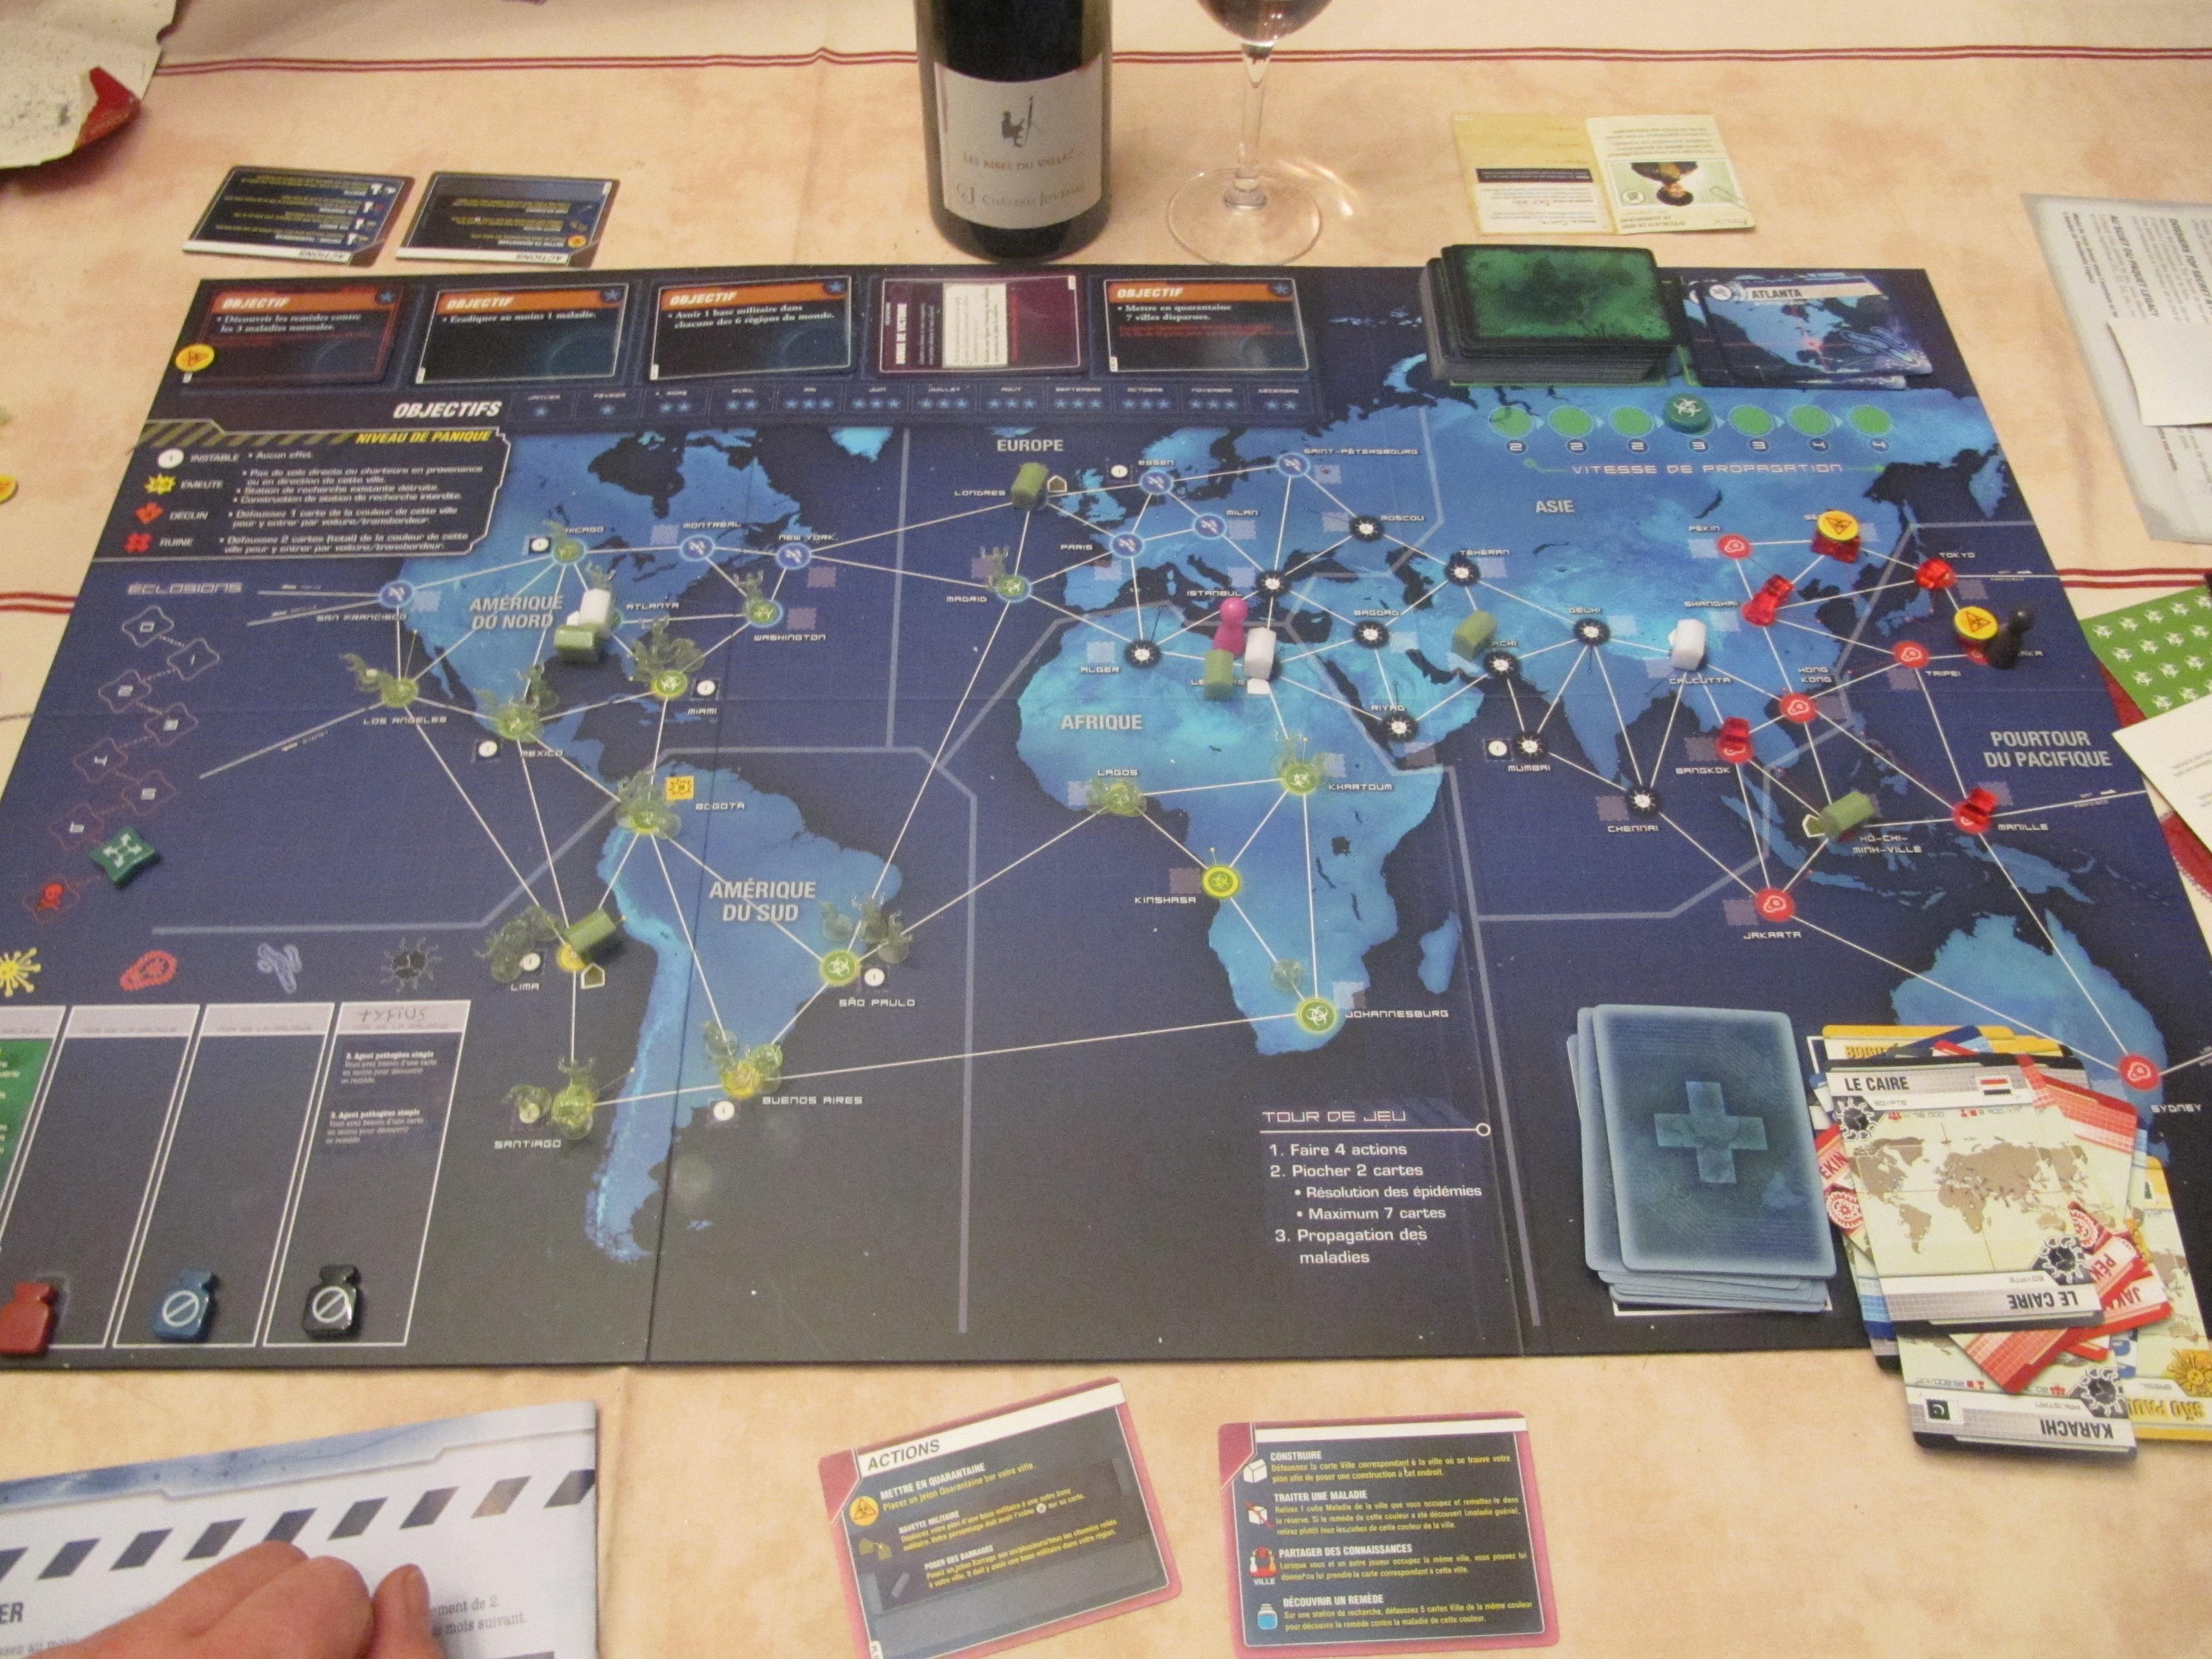 1220 Pandemie leg 9